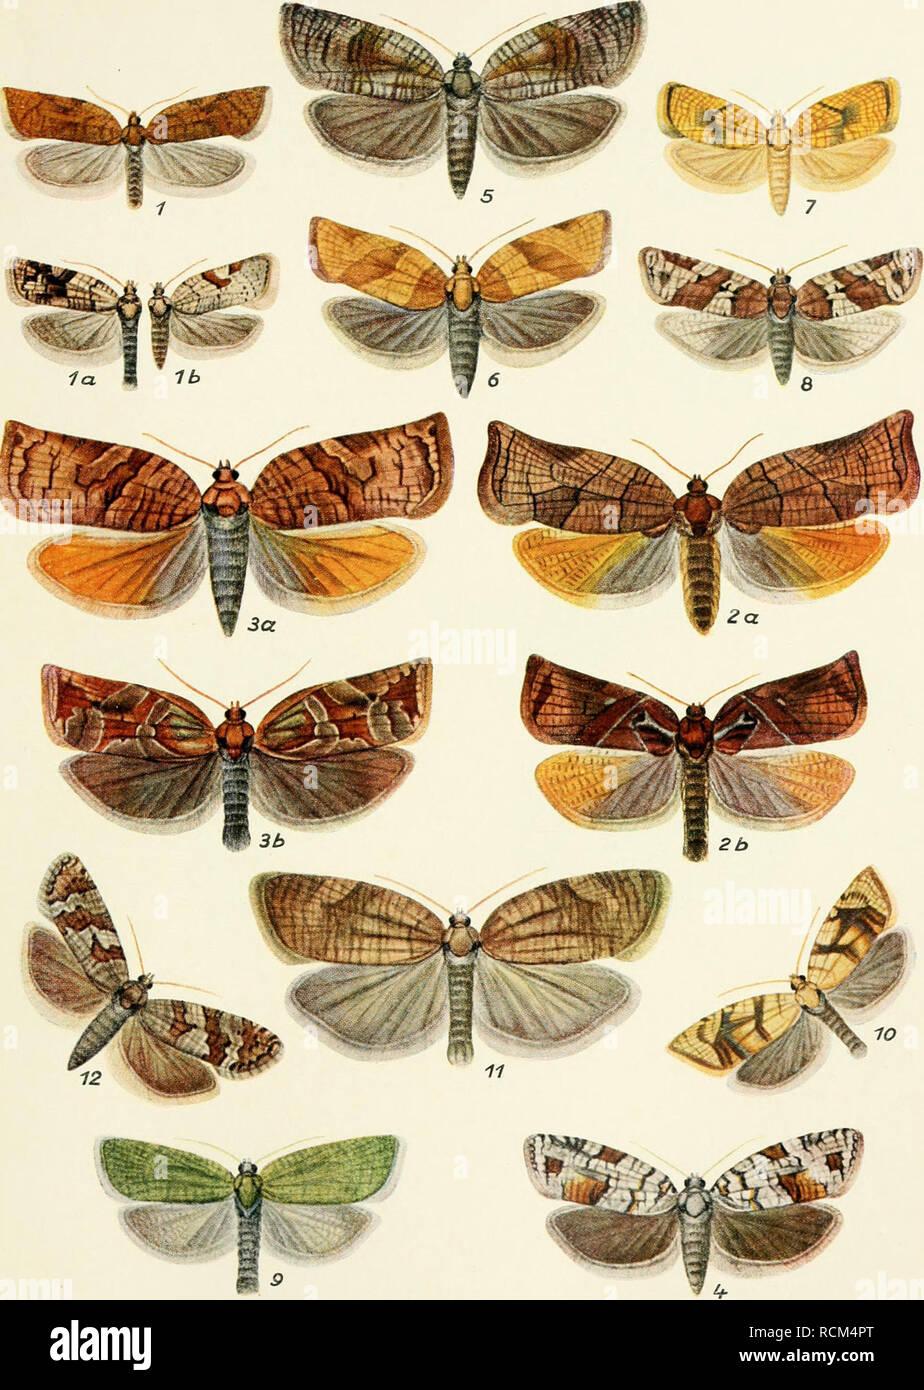 ". Die forstinsekten Mitteleuropas. Ein lehr- und handbuch. Trees; Beneficial insects. EscJiericli, Forstiiisckicii. III. Bd. Tafel n. Tortriciden I ^ i^""^nel del. 1 Acalla fcrrueana Tr. lau. b (S u. Q Varietät 2a u. b Cacoccia podana Sc. ß u. cf. /!a u. b C. picoana L- Qv. r^. 4 C. histrionnna Froel. Q. 5 C. murinana Hb. &;. 6 Pandemis ribeana Hb. U- 7 Torlrix forskaleana L. &'. 8 T. politnna Hic. £. 9 T. viridana L. cf- 1"" T. loefflingtana L. d- 11 T. viburniana Schiff, cf- 1'-' T. wahlbomiana L. ^. Vergr. 2'jmal.. Please note that these images are extracted from scanned pag - Stock Image"